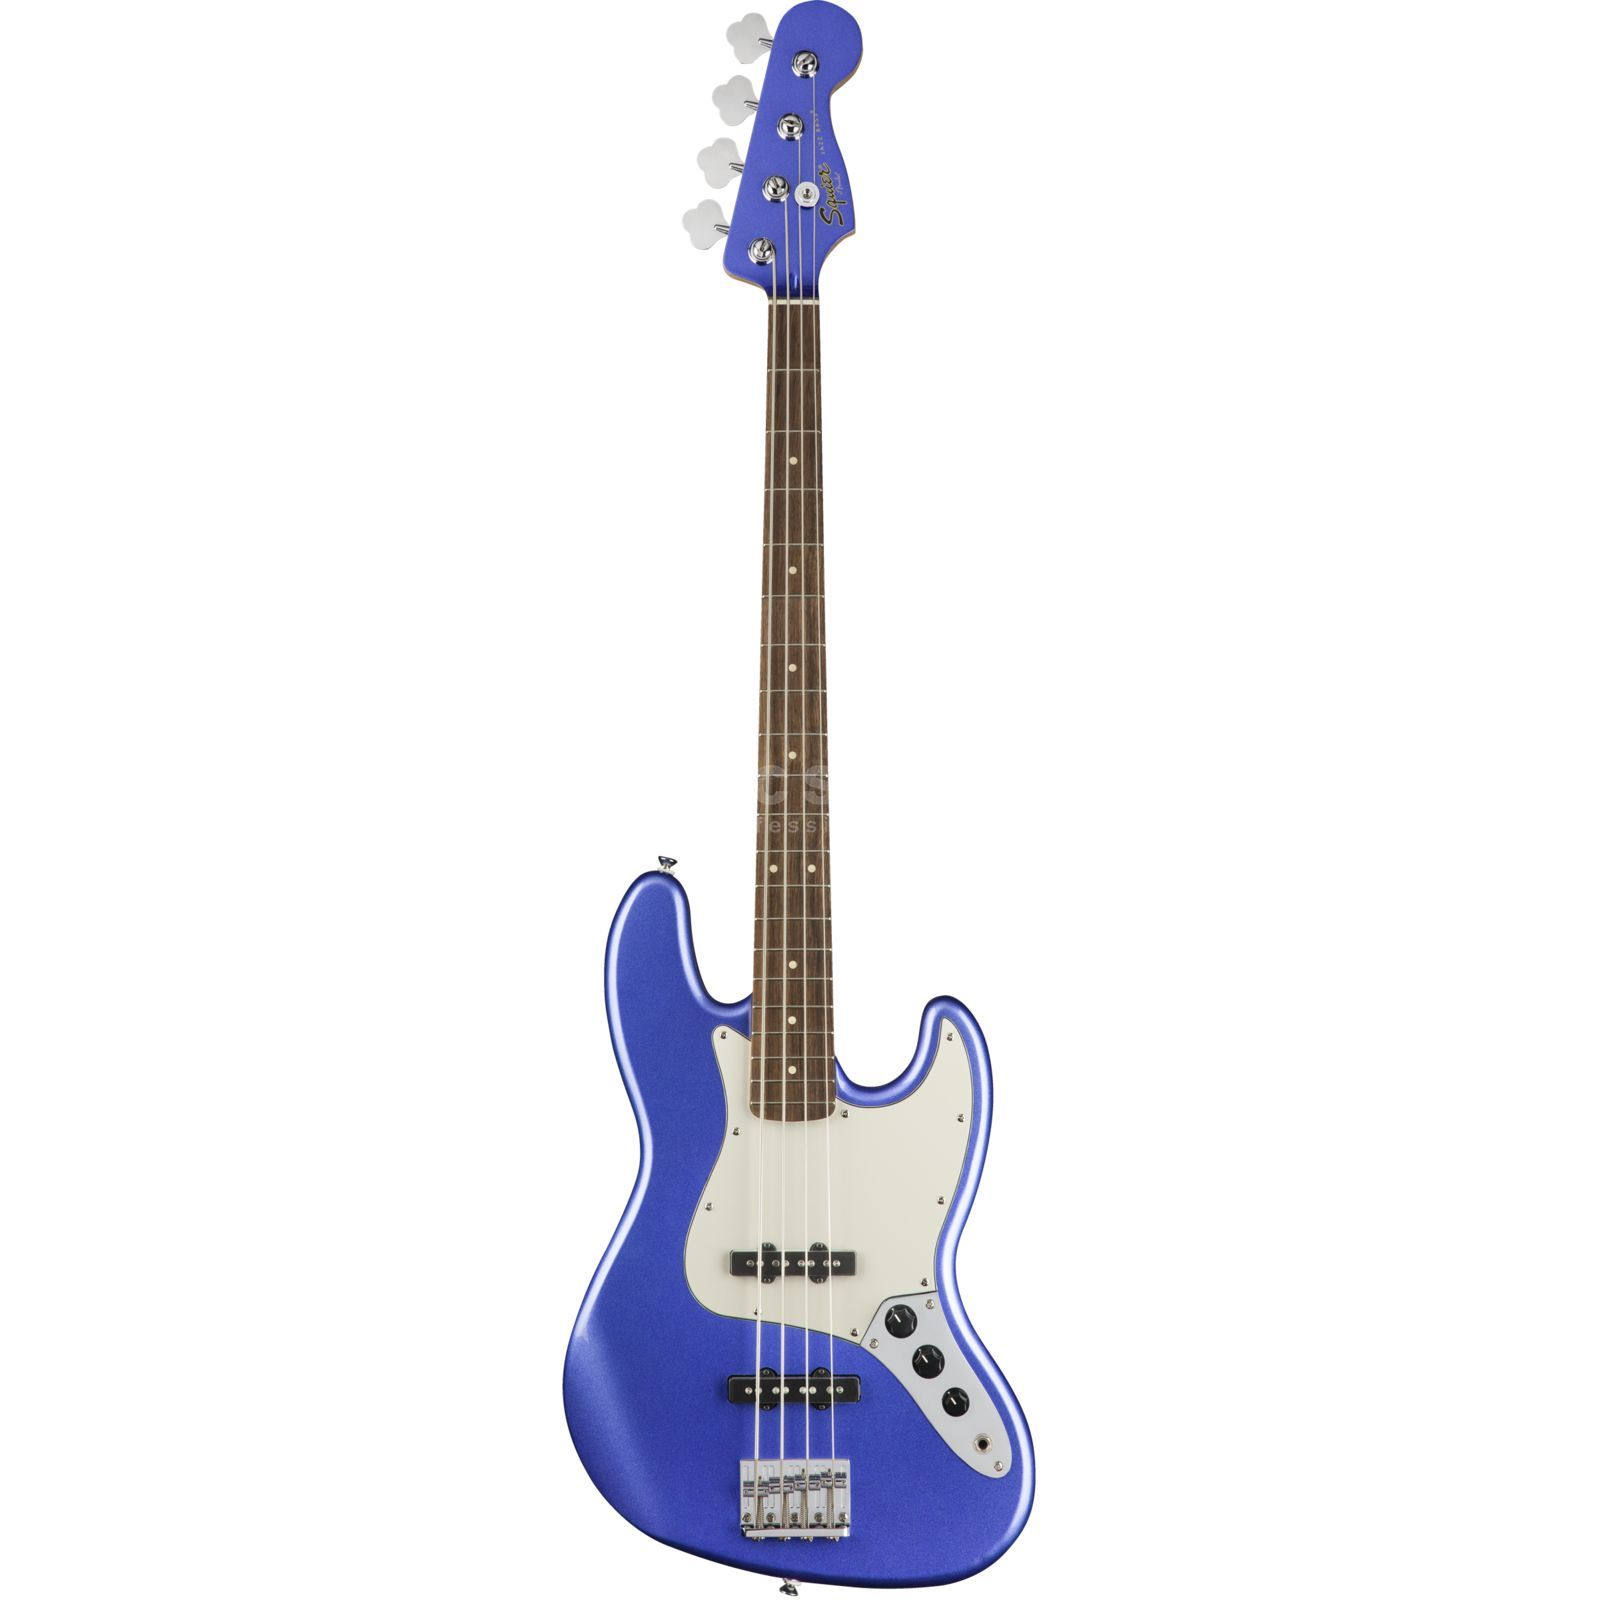 Fender Squier Contemporary Jazz Bass Ocean Blue Metallic